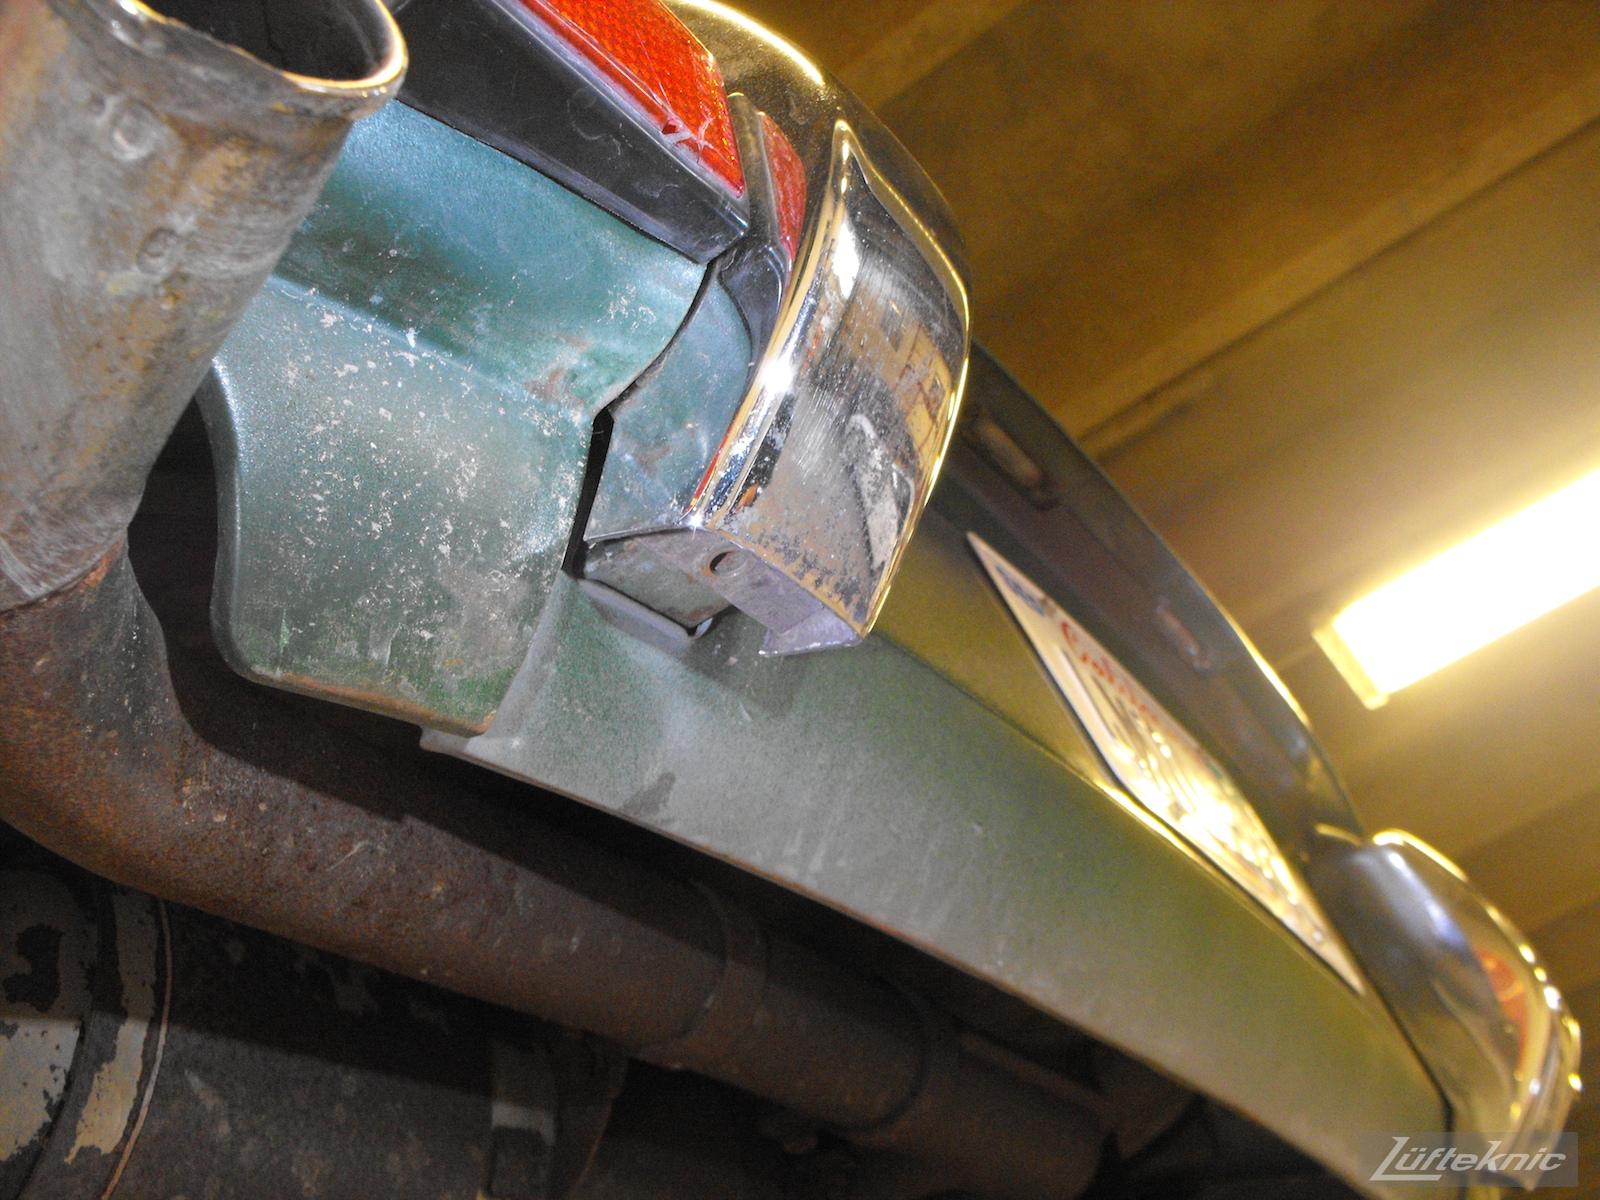 An Irish Green Porsche 912 undergoing restoration at Lufteknic with uneven body panels shown.